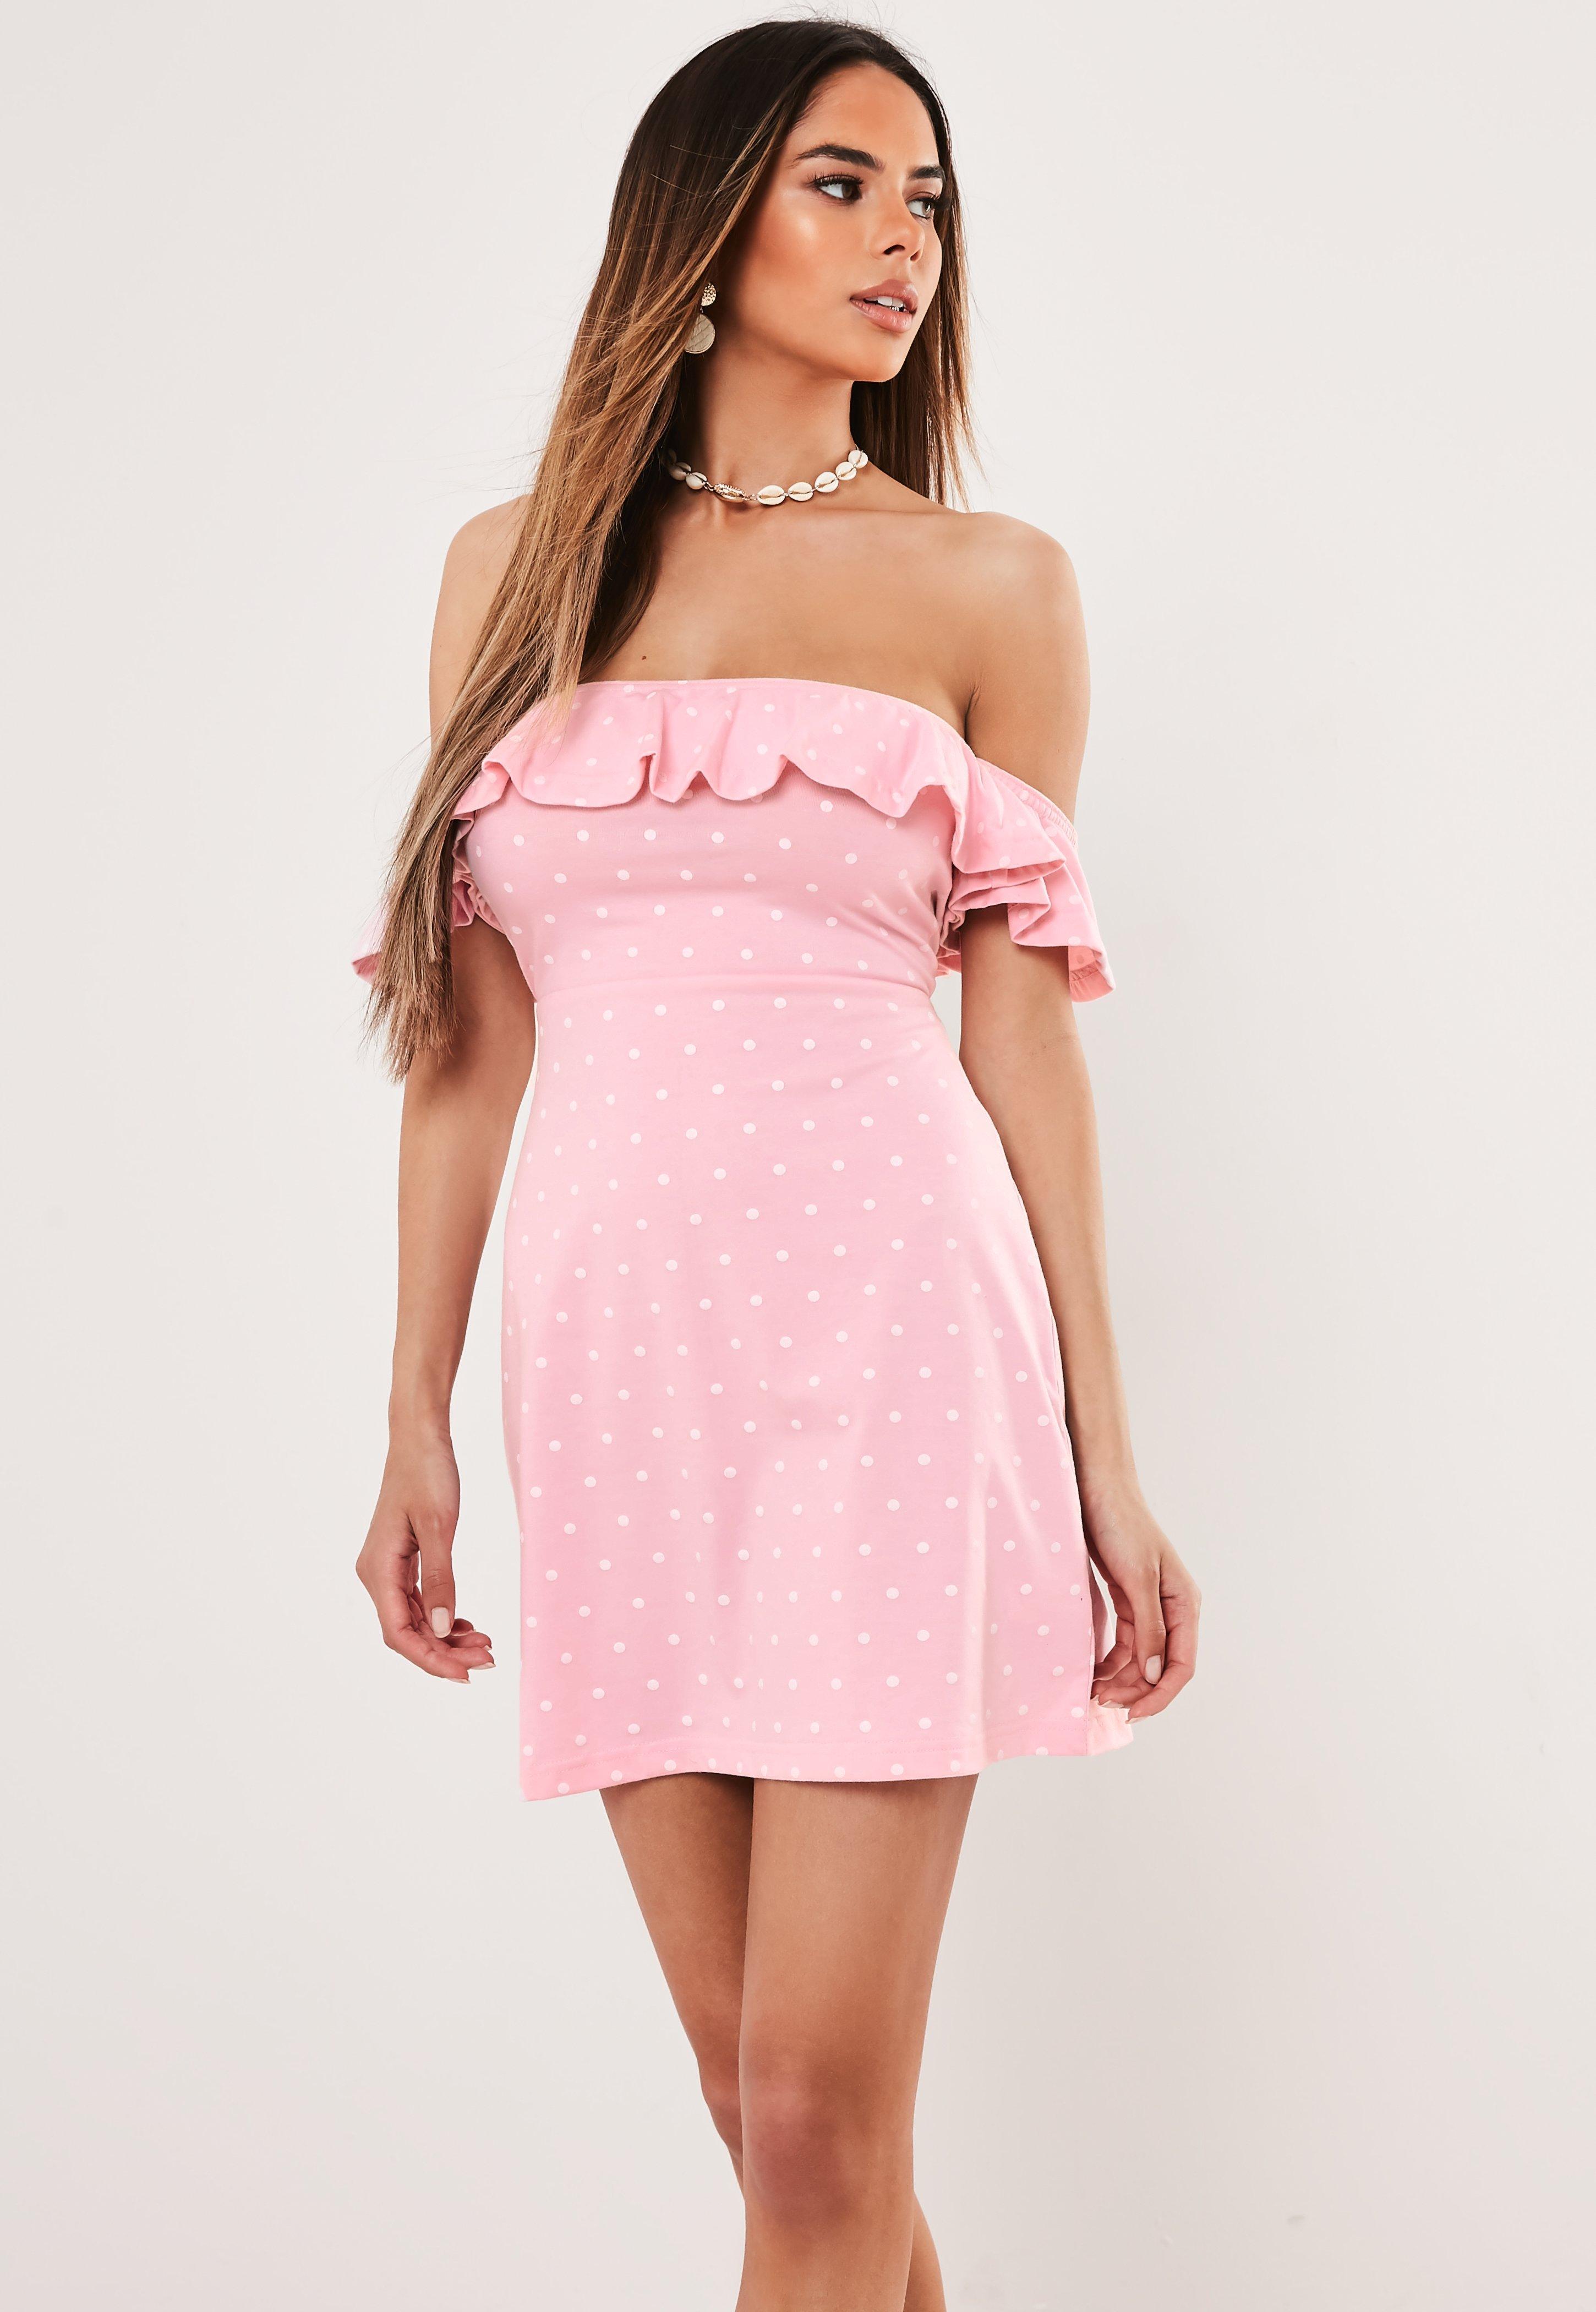 5ff7fe4eeeb Pink Dresses | Hot Pink & Light Pink Dresses - Missguided